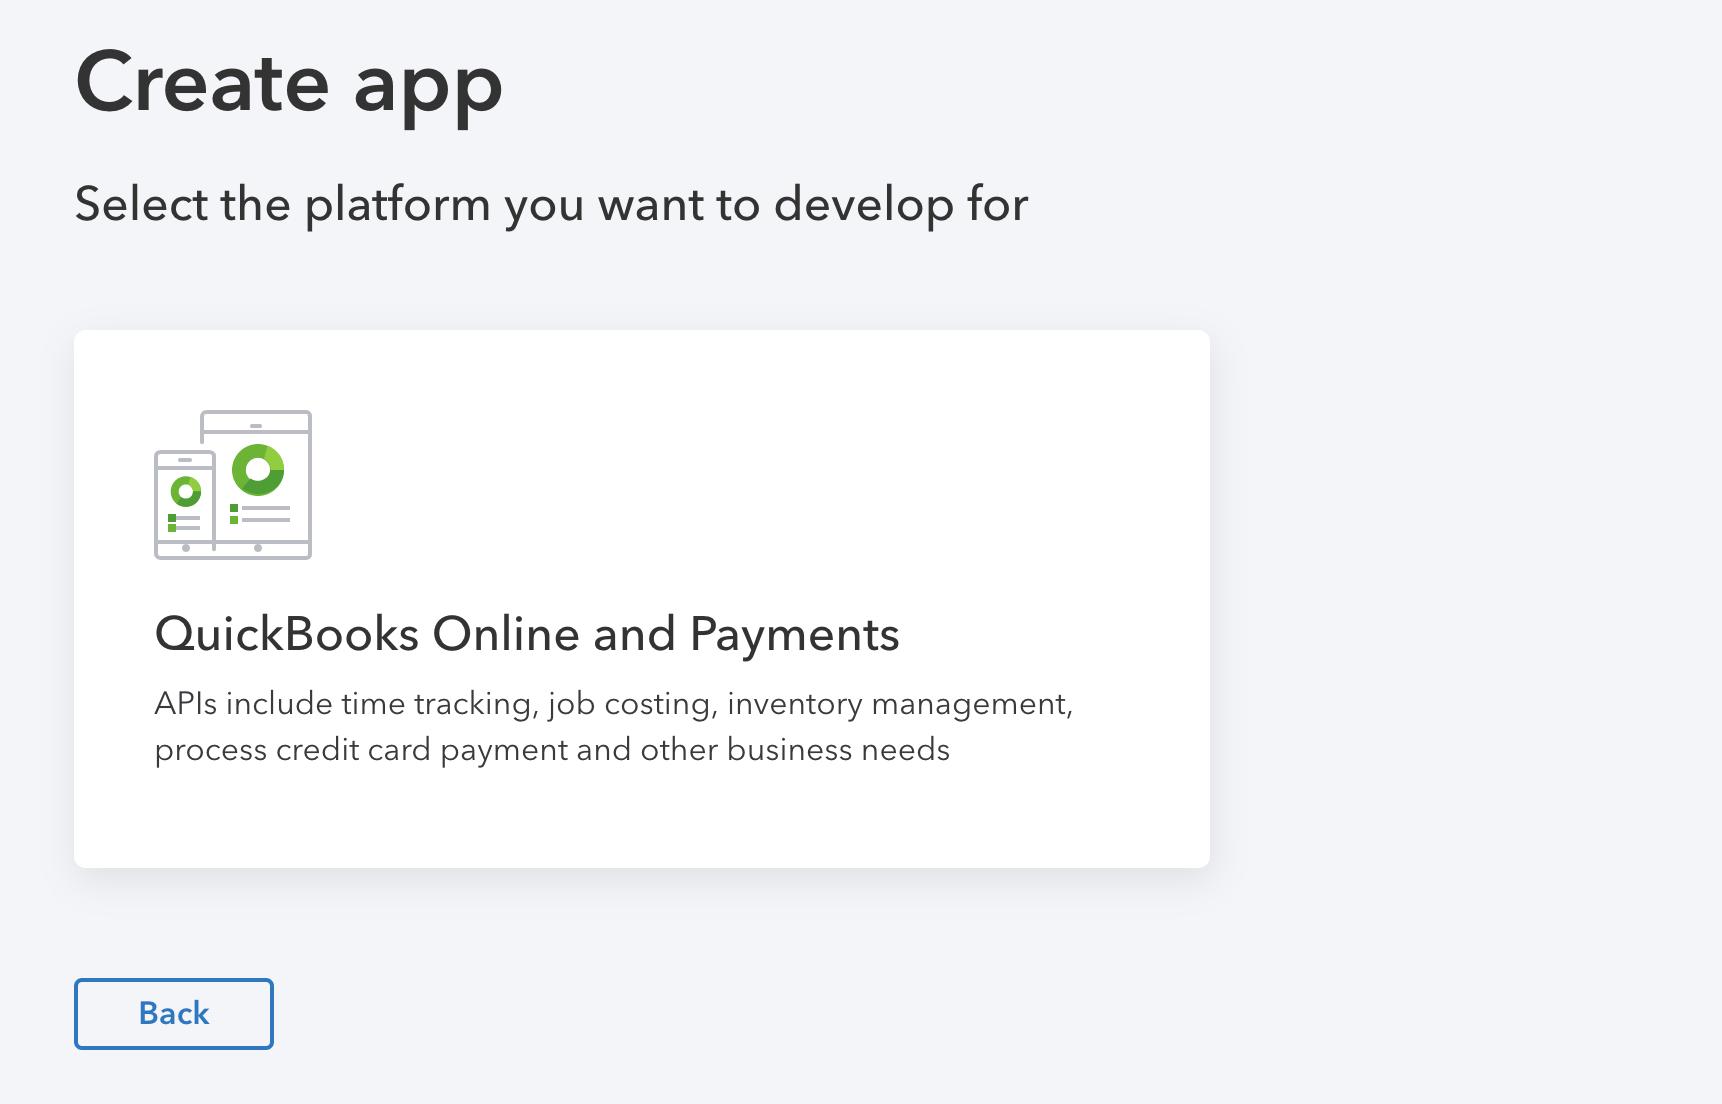 qbo/docs/create-app-3-v1.png